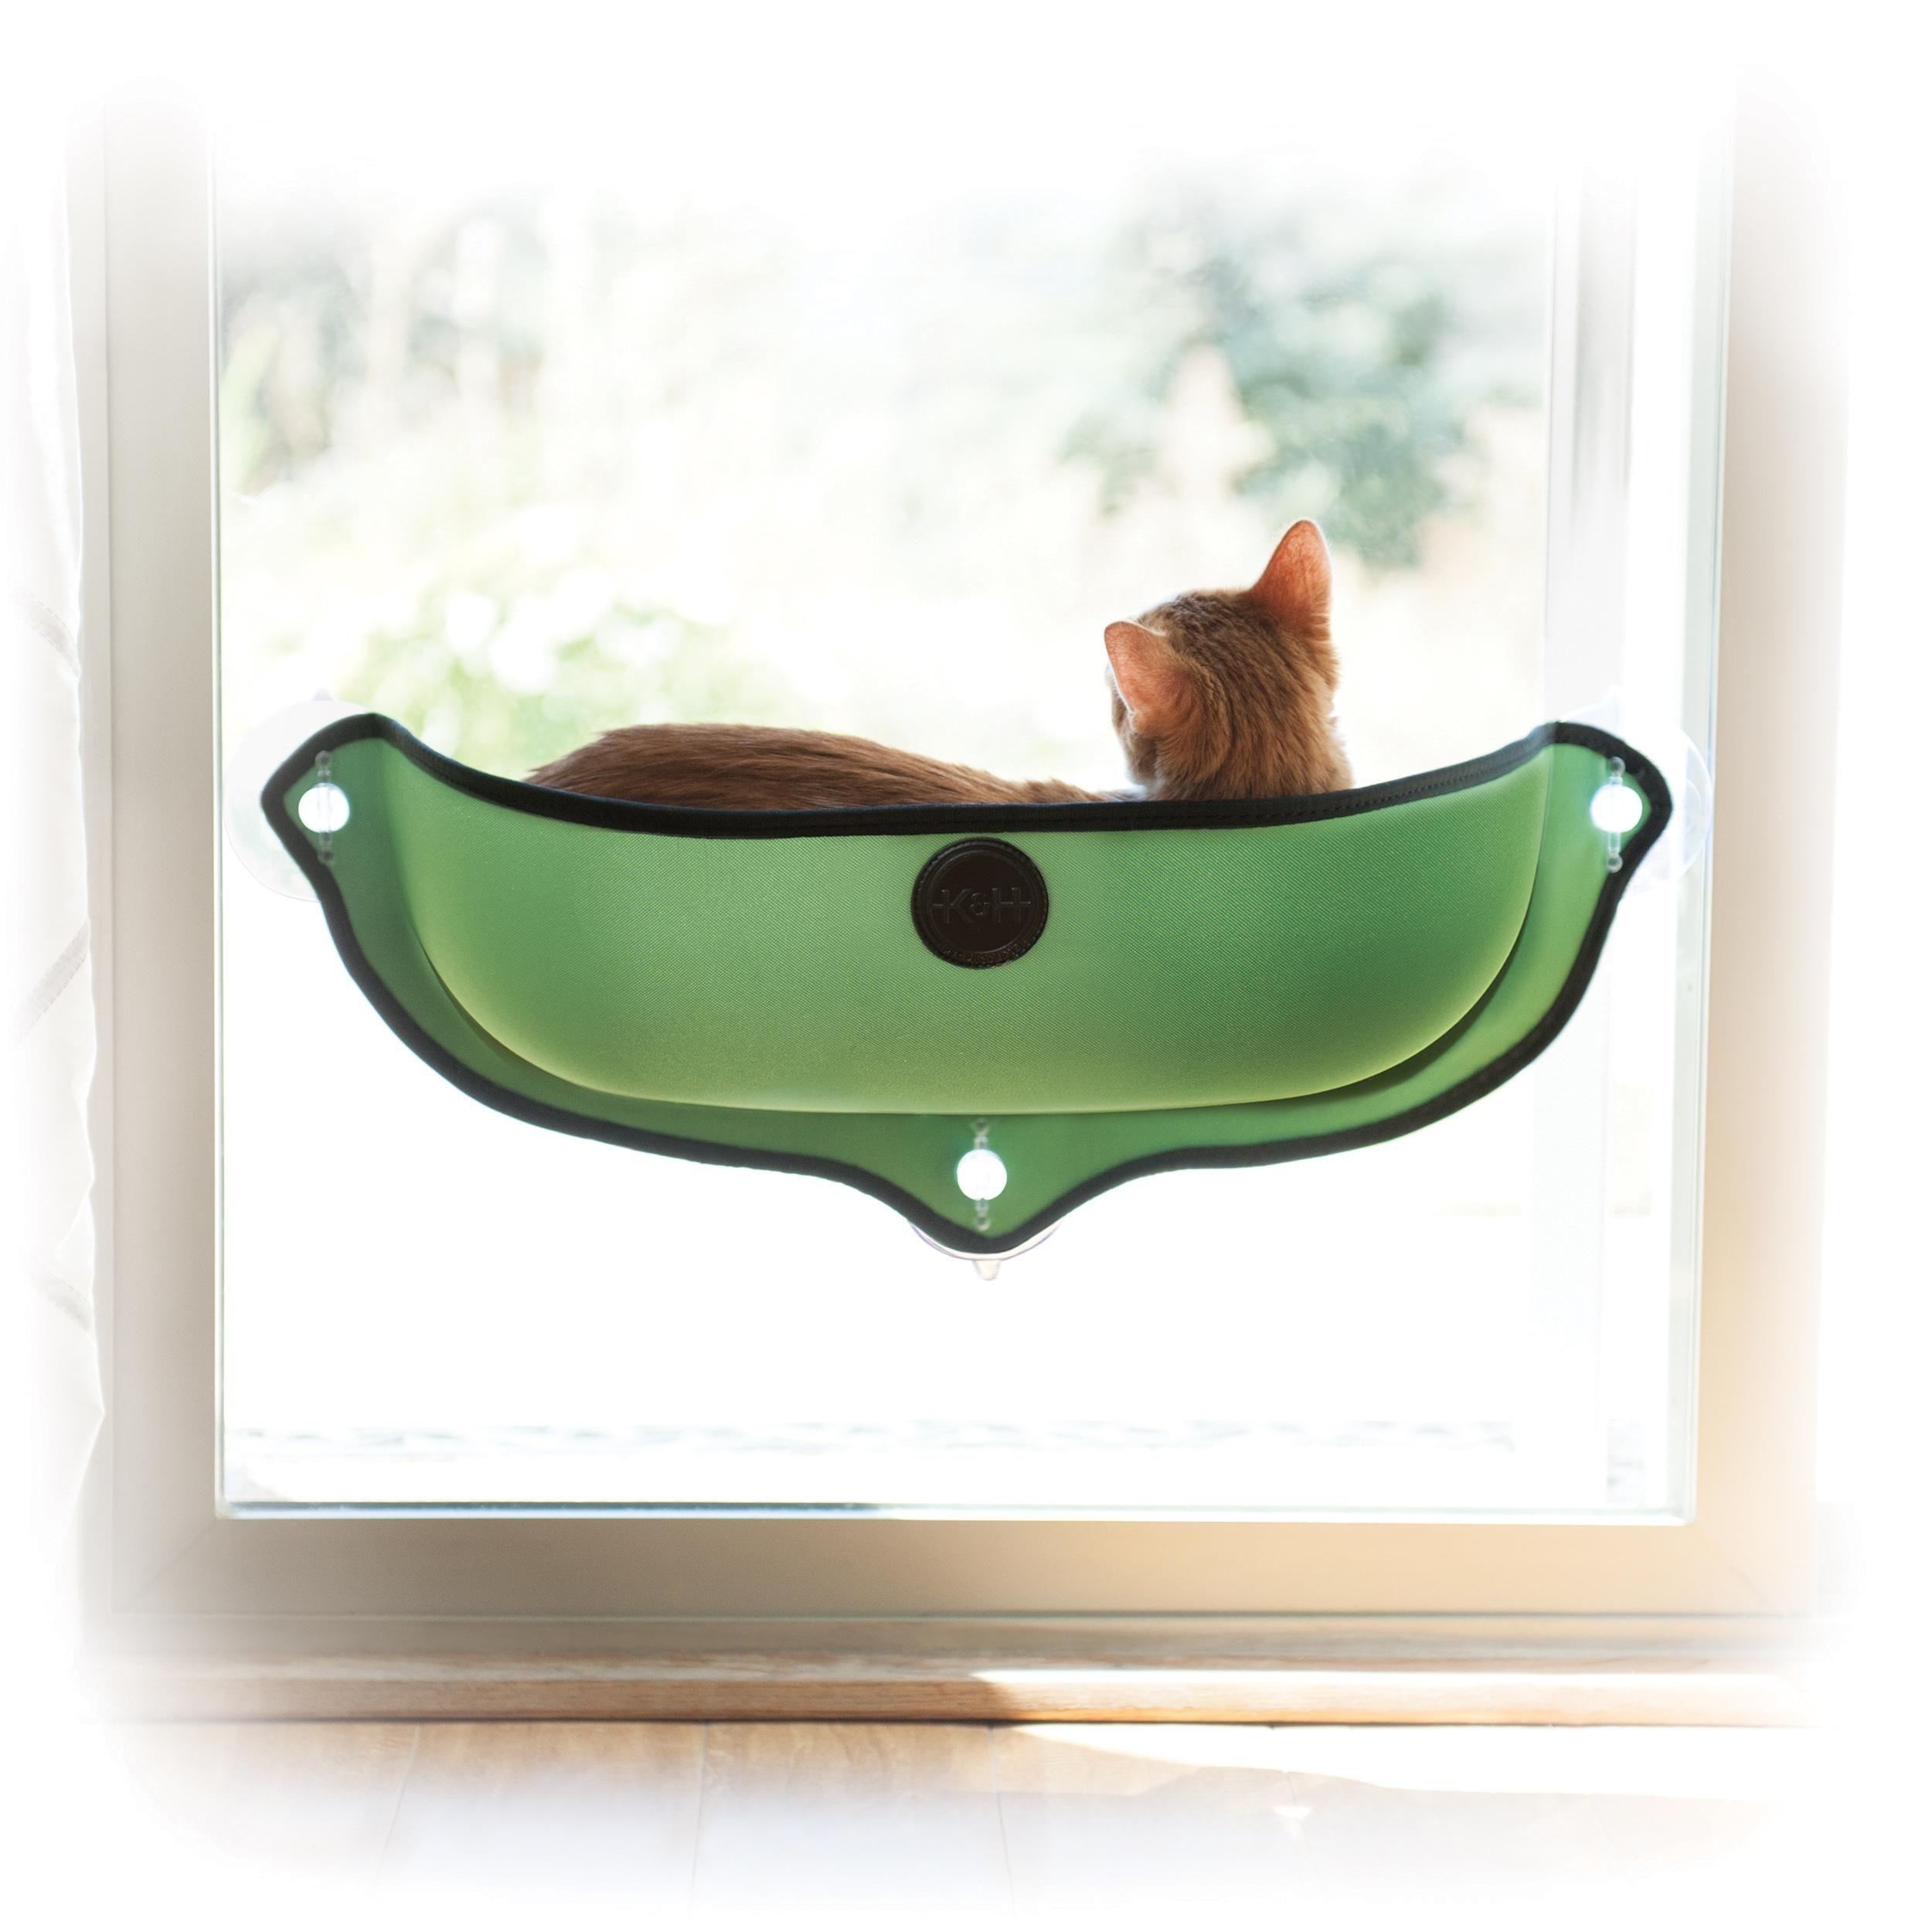 Houses, Kennels & Pens Fine 2018 Sucker-style Cat Hammock Window Cat Basking Window Perch Cushion Sunny Dog Cat Bed Hanging Shelf Seat Great For Multiple